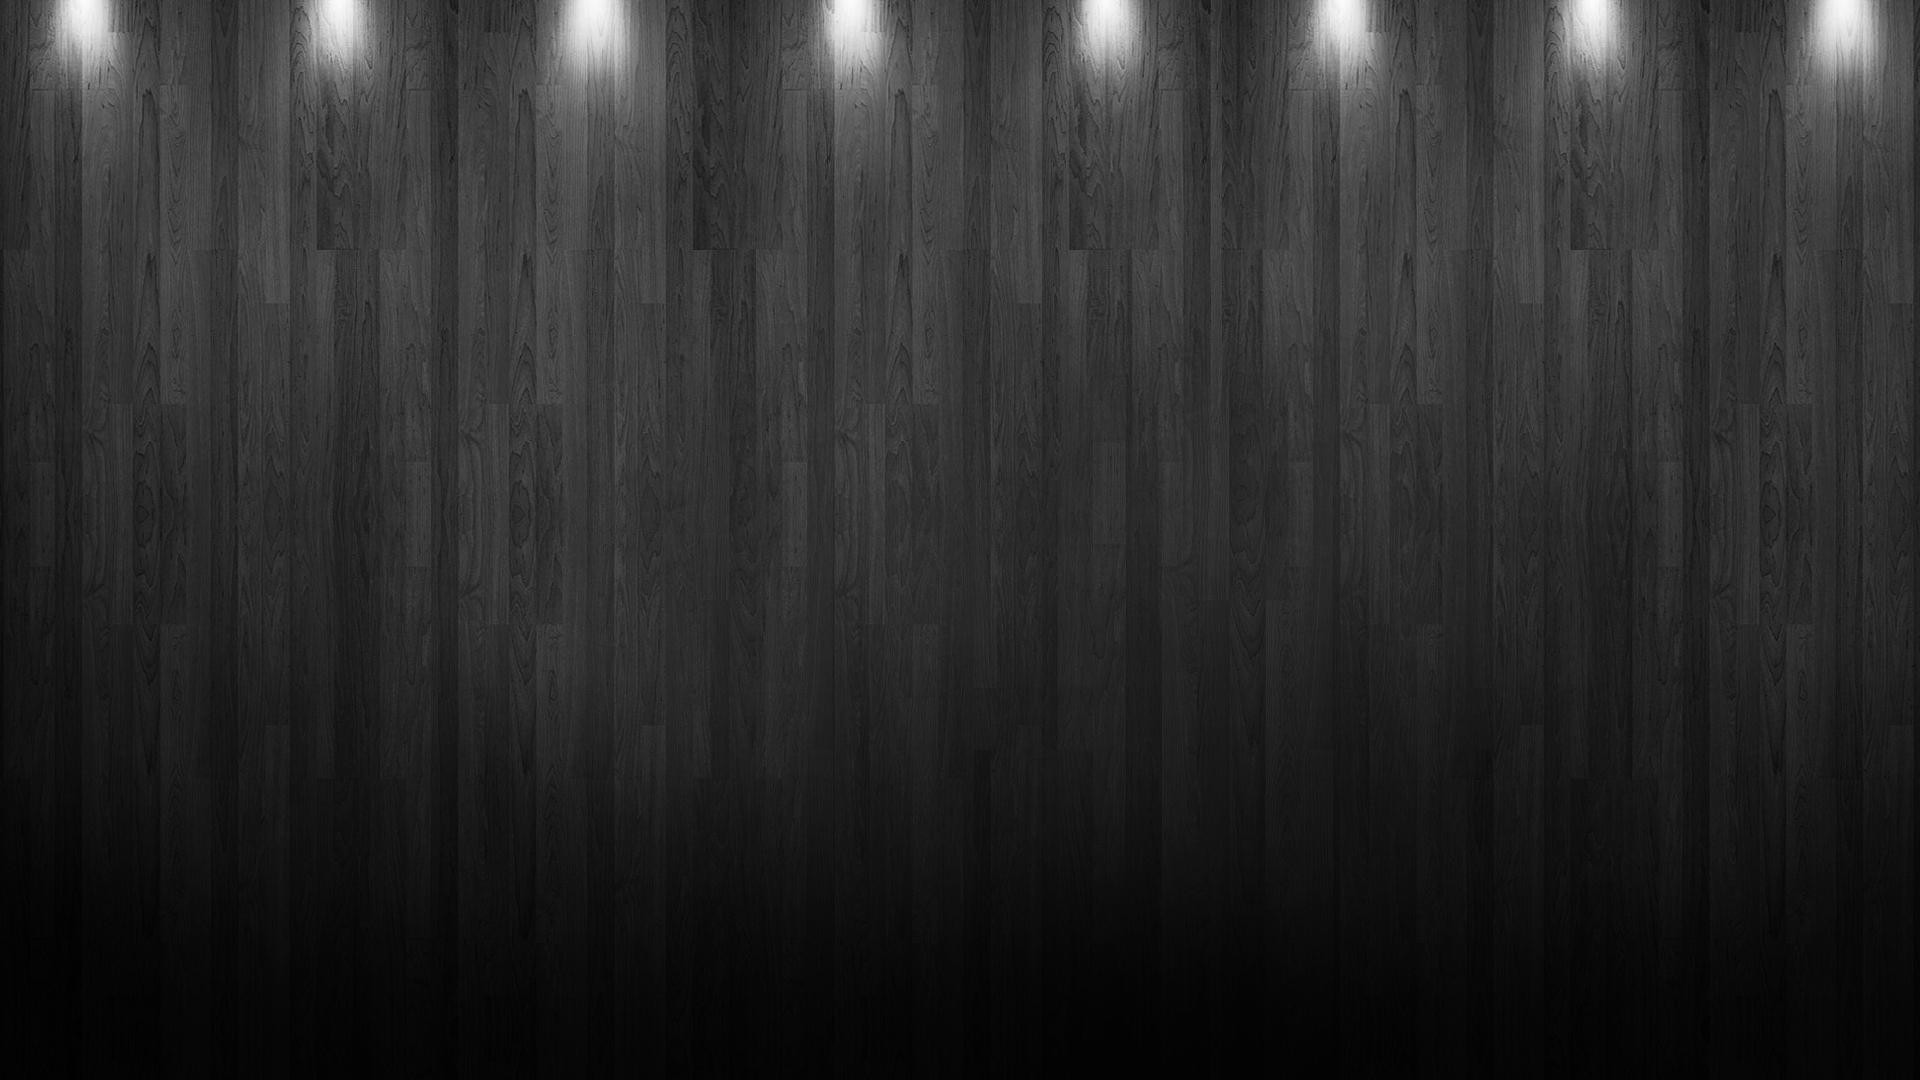 wallpaper.wiki-Black-Images-HD-1920×1080-PIC-WPD0011613